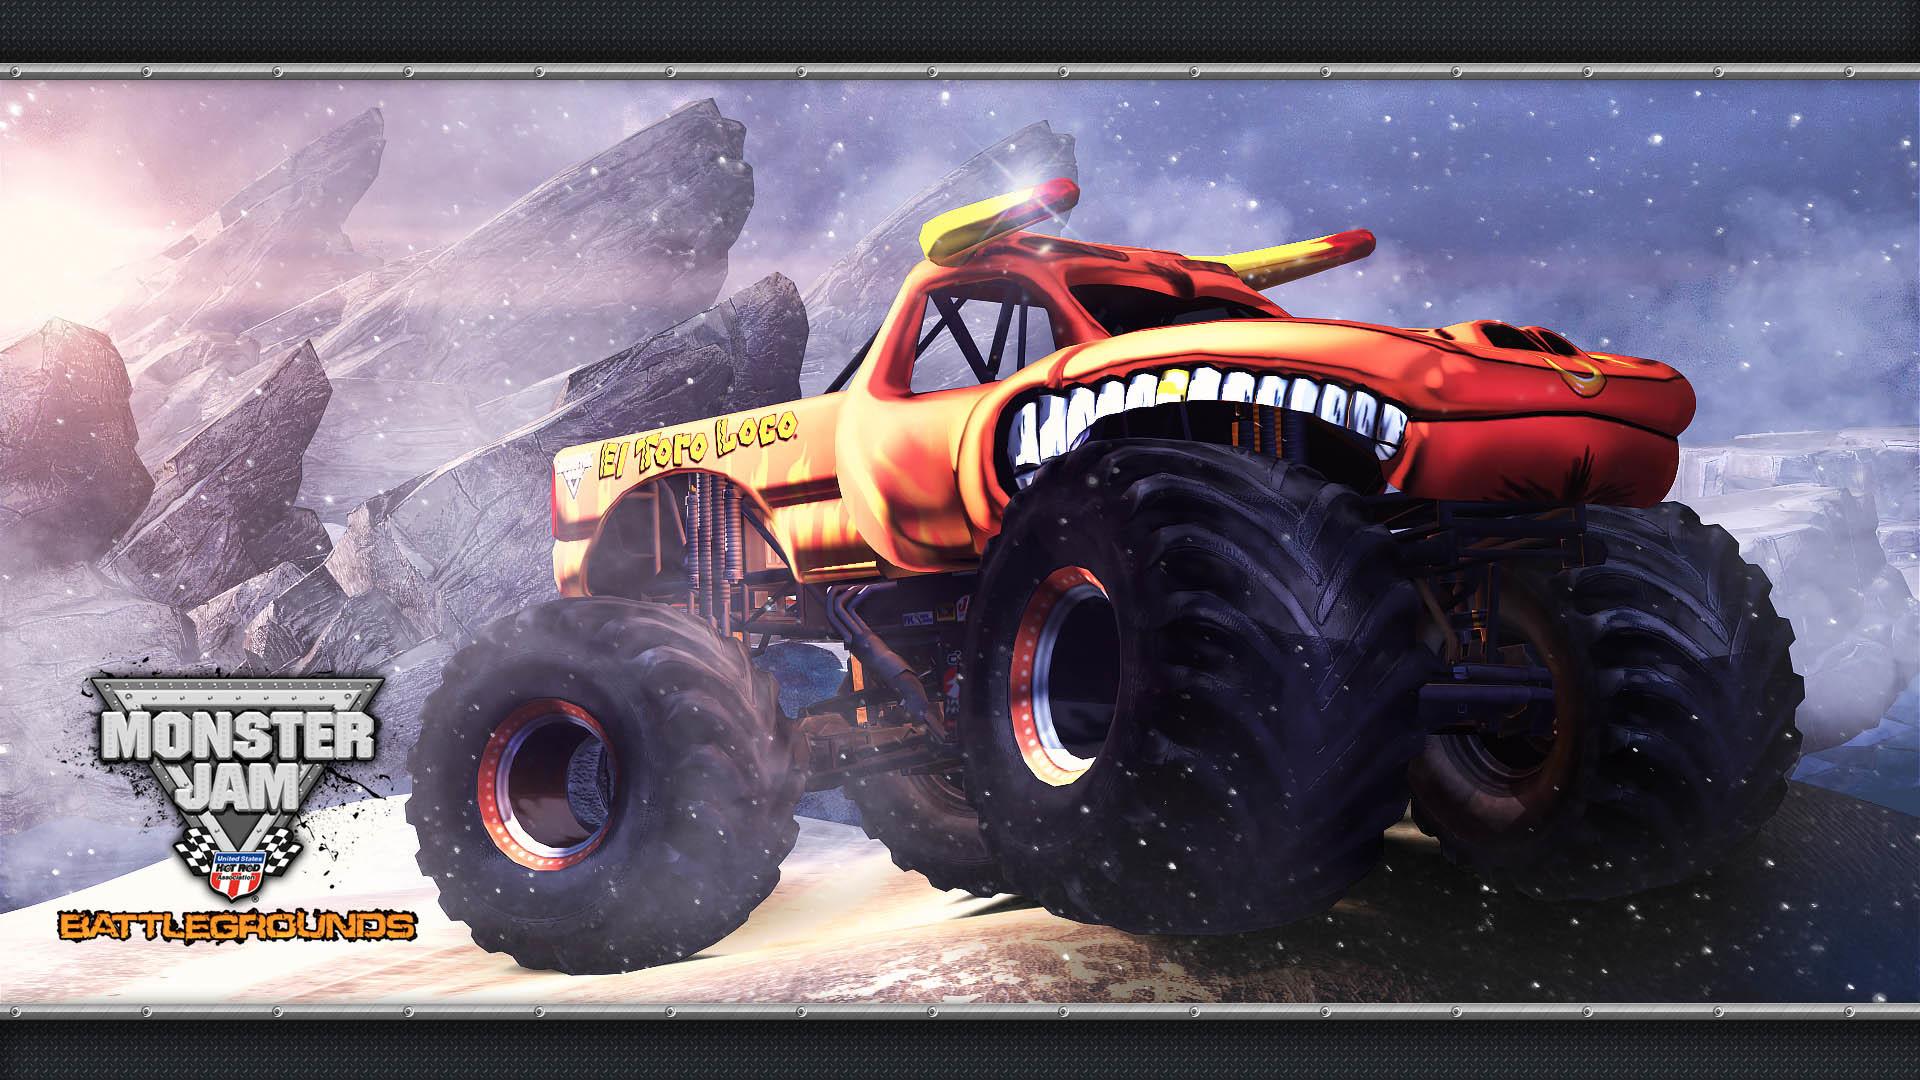 Monster Truck Hd Wallpaper   El Toro Loco Background 1920x1080